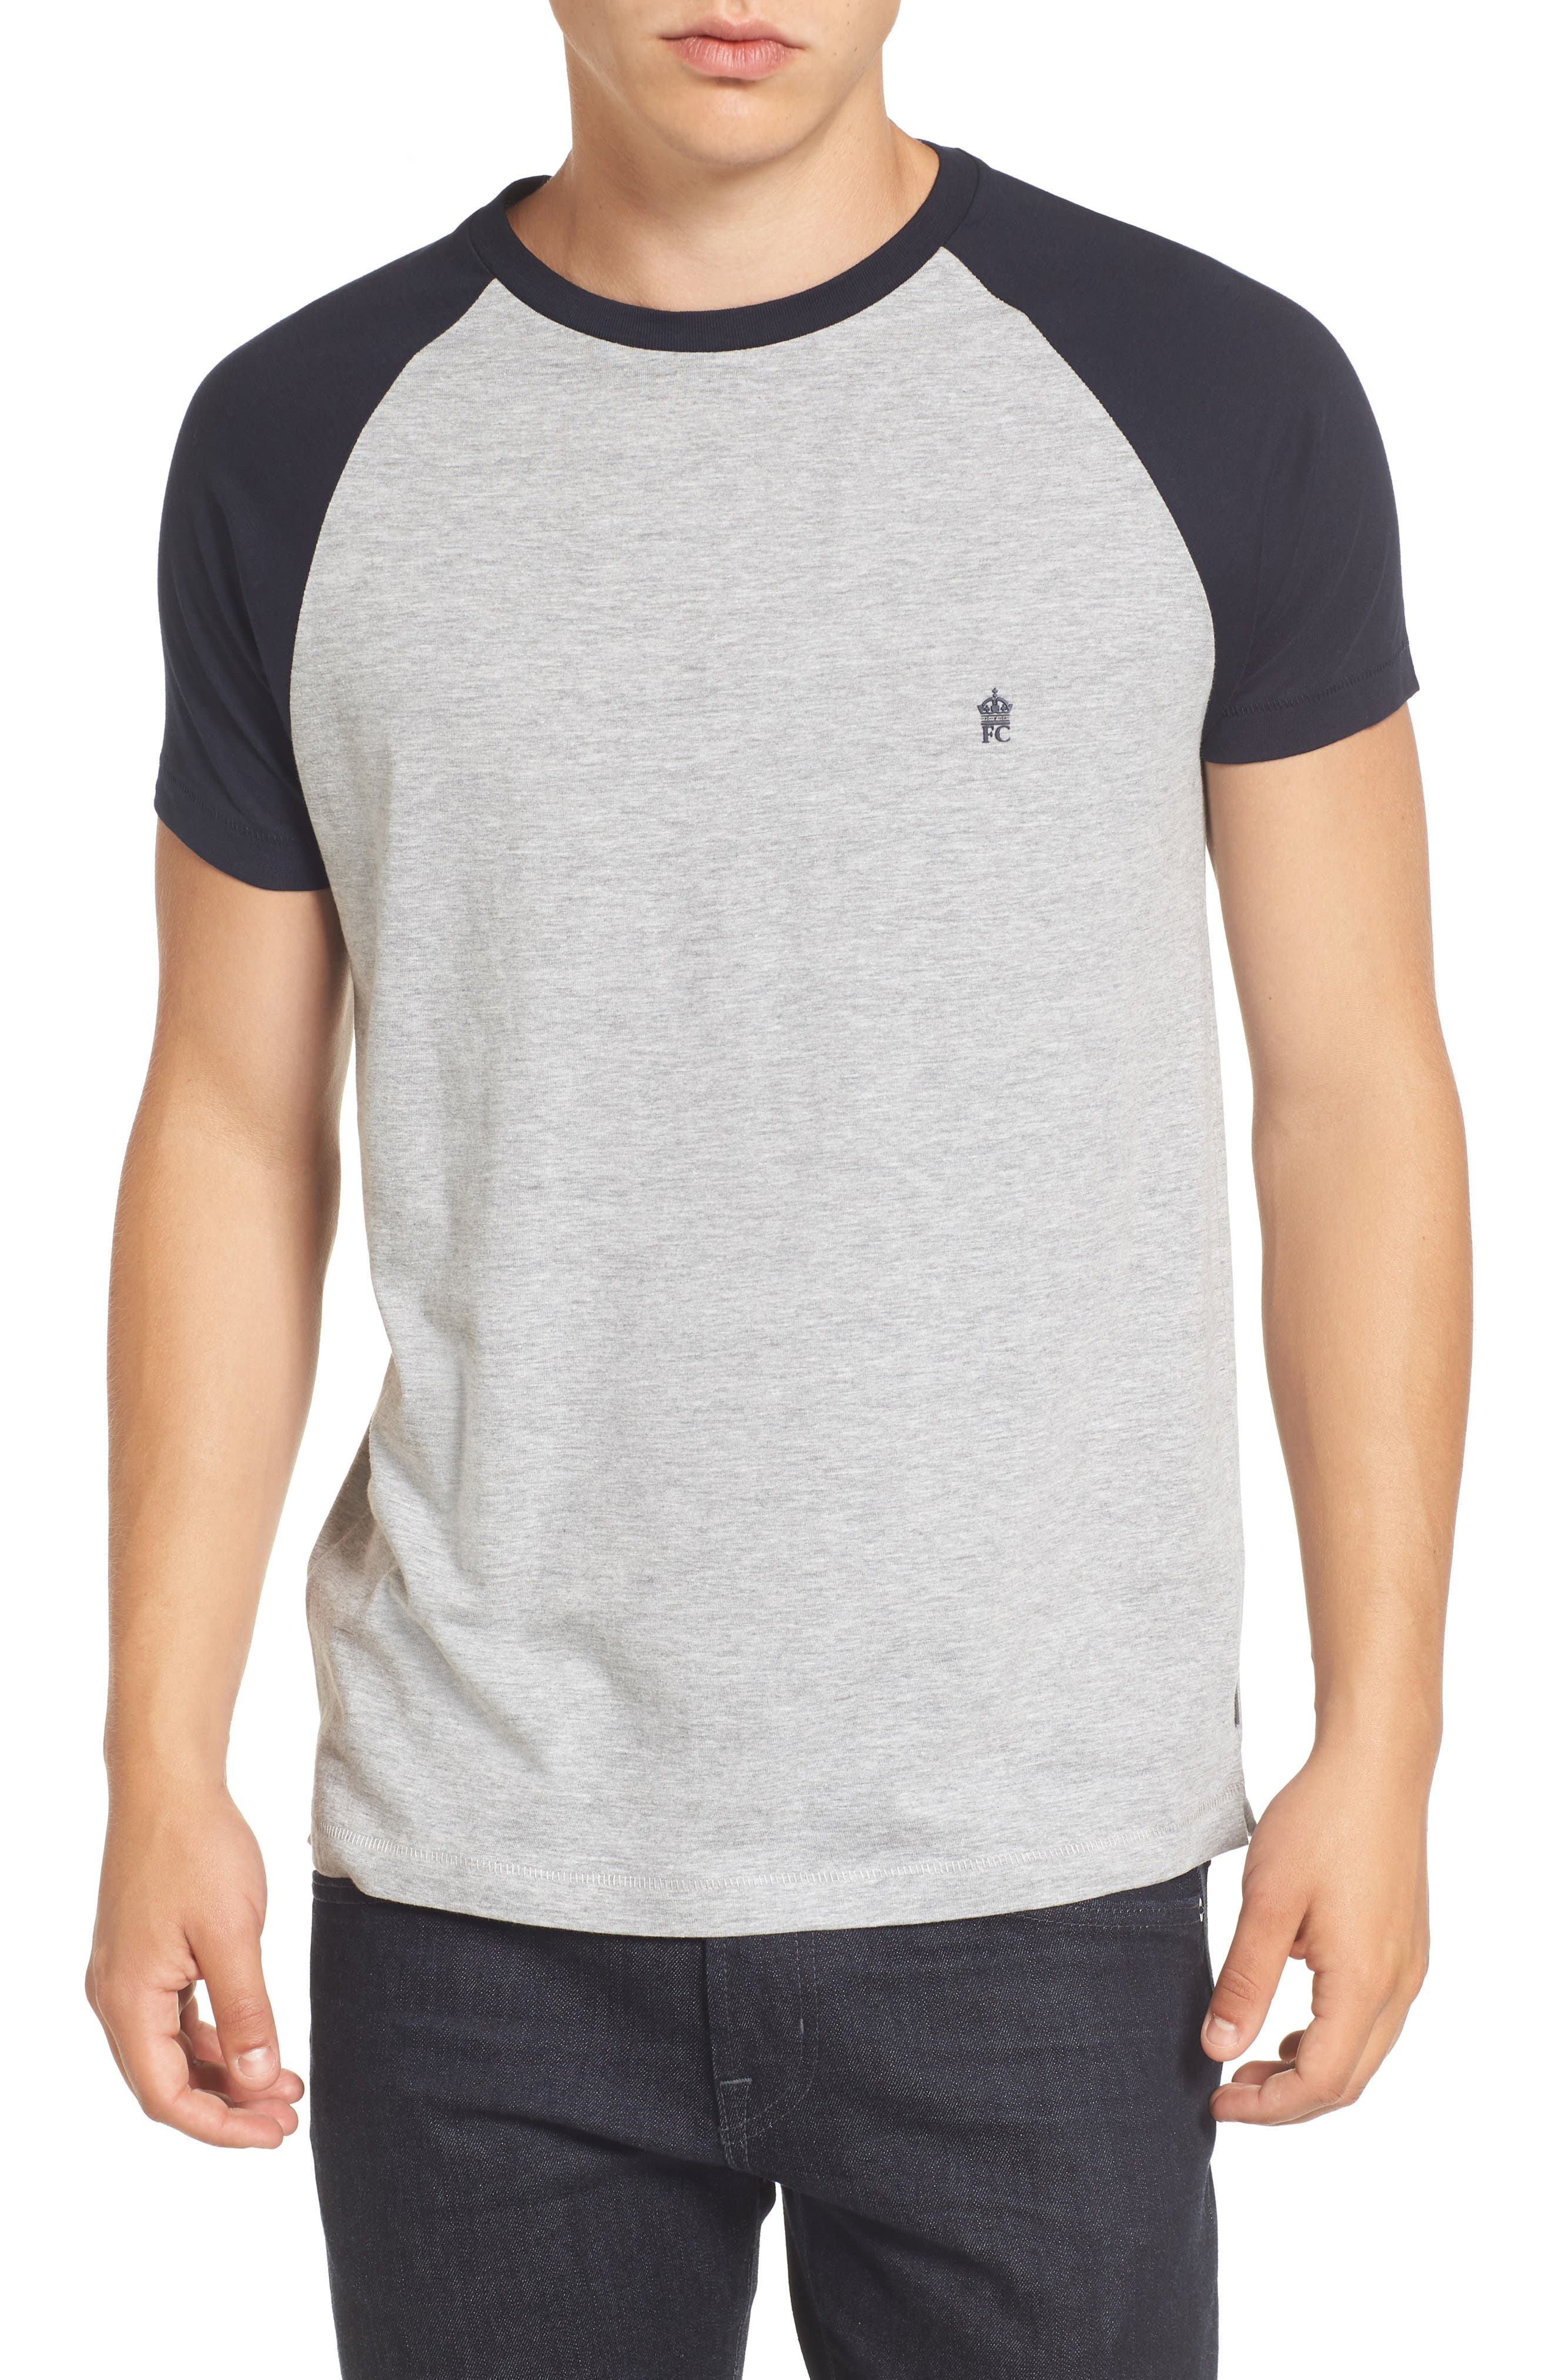 French Connection Raglan Short Sleeve T-Shirt